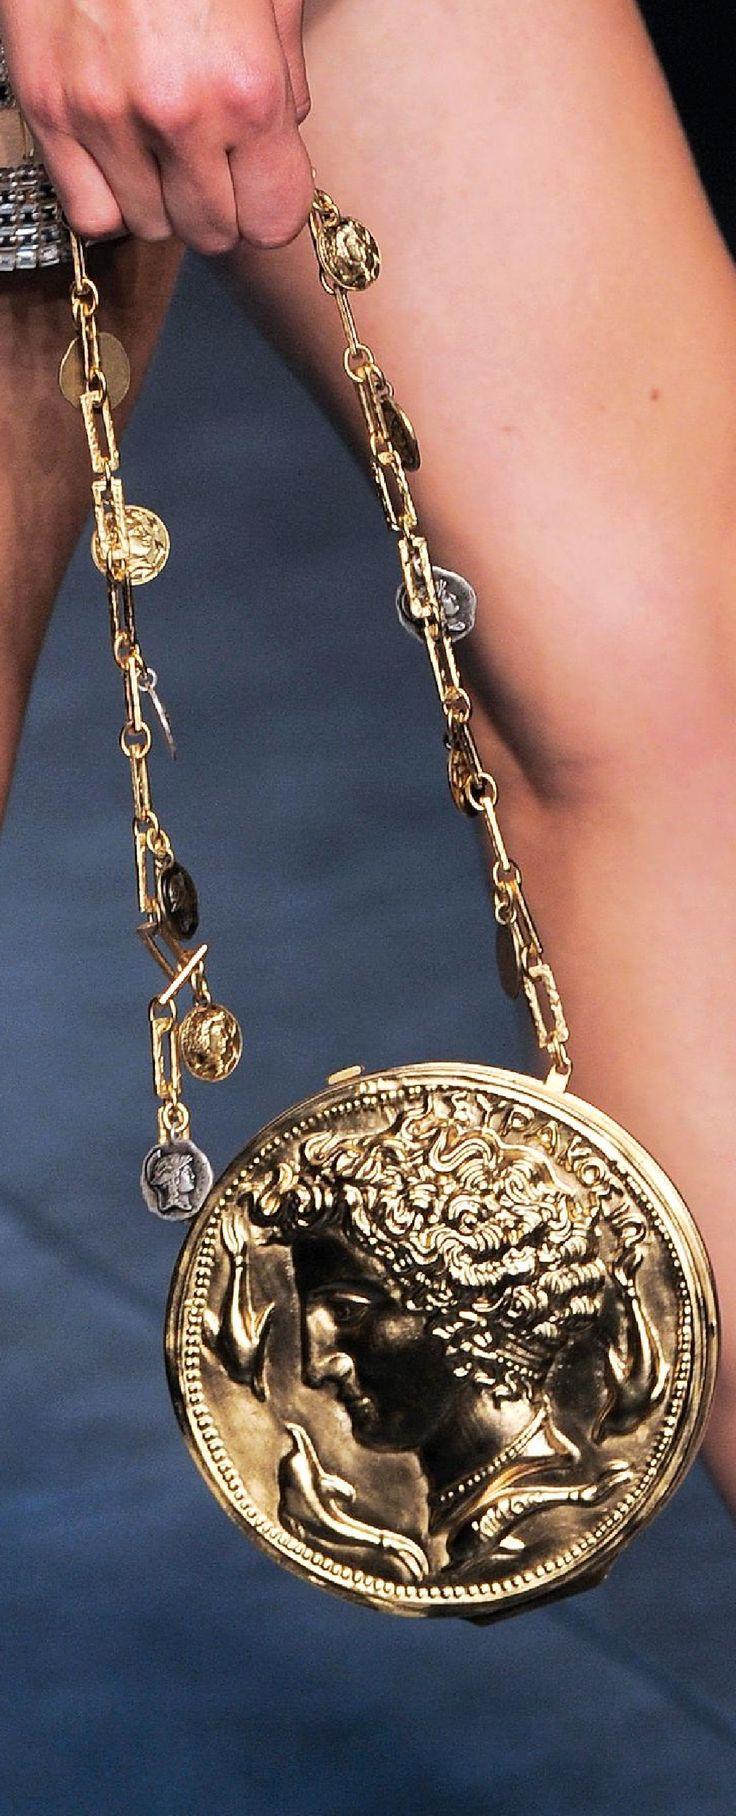 SPRING 2014 RTW Dolce & Gabbana